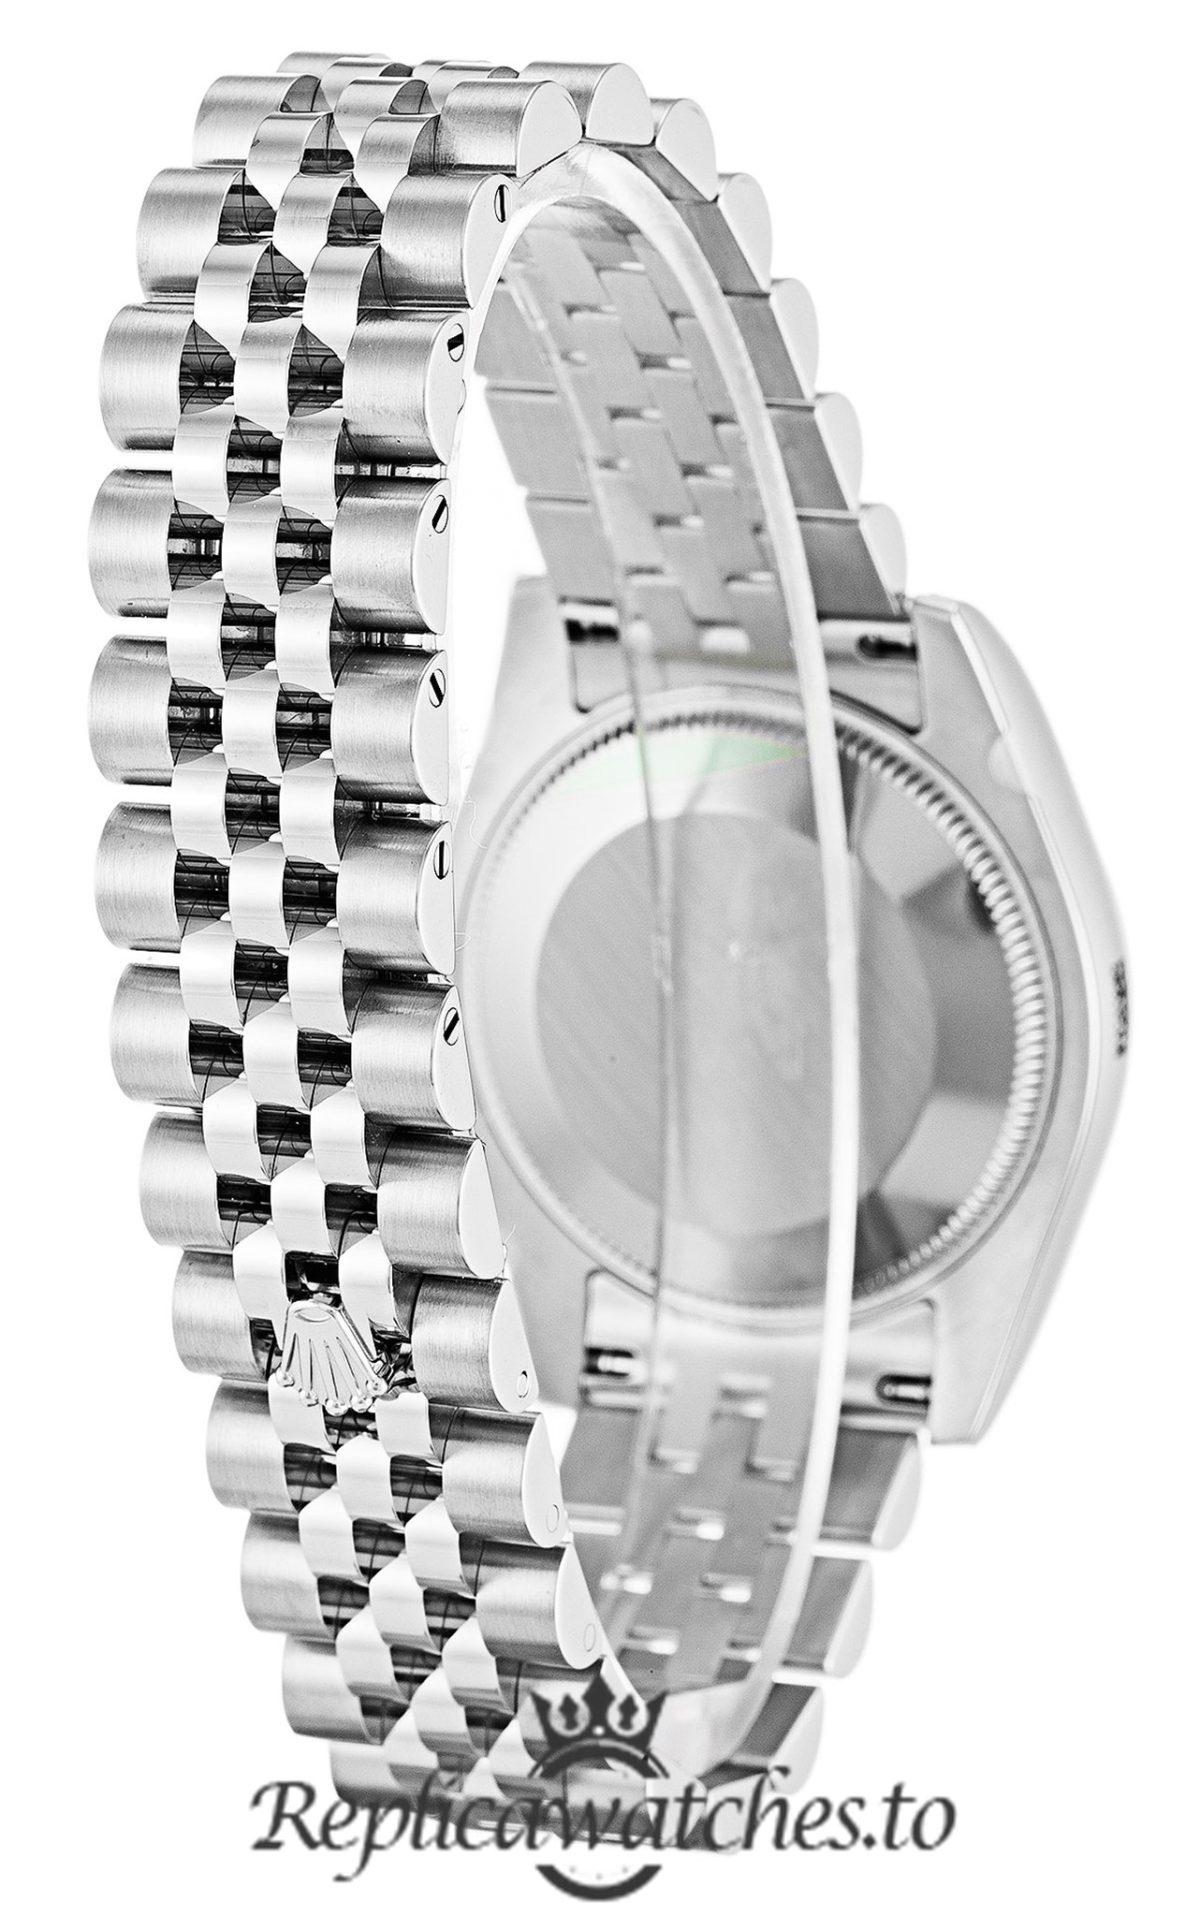 Rolex Datejust Replica 178240 001 Silver Bezel 31MM